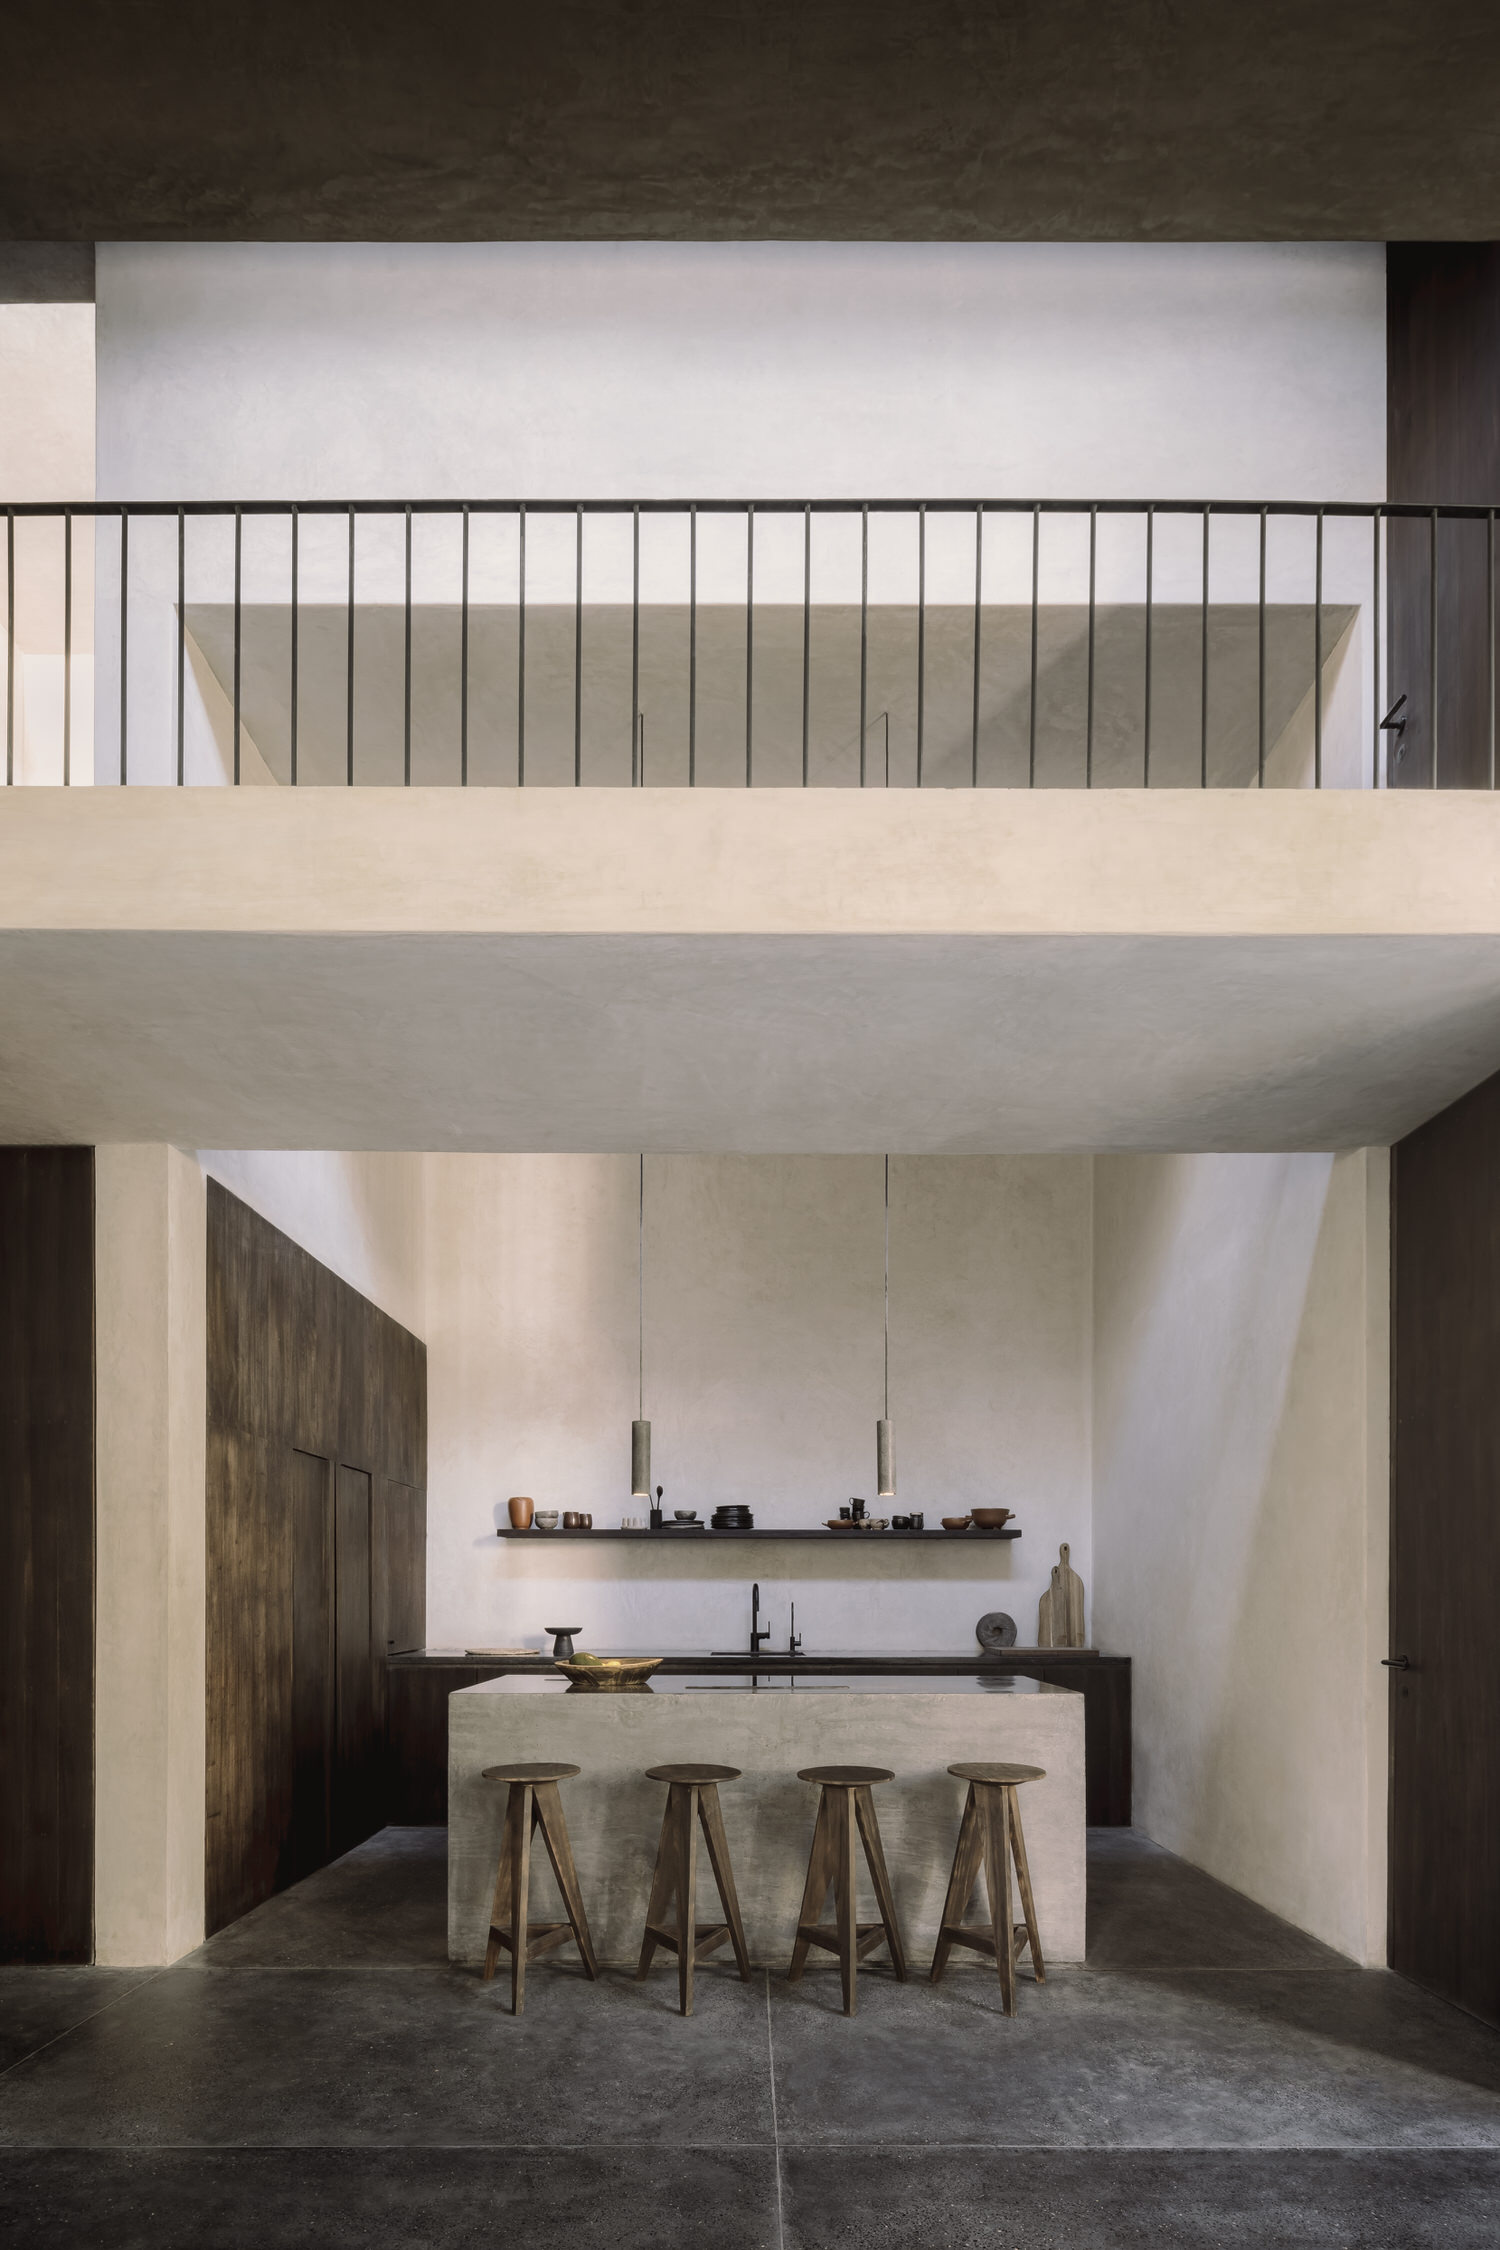 Co Lab Design Office Aviv House Tulum Mexico Arxhitecture Photo Cesar Bejar Yellowtrace 13